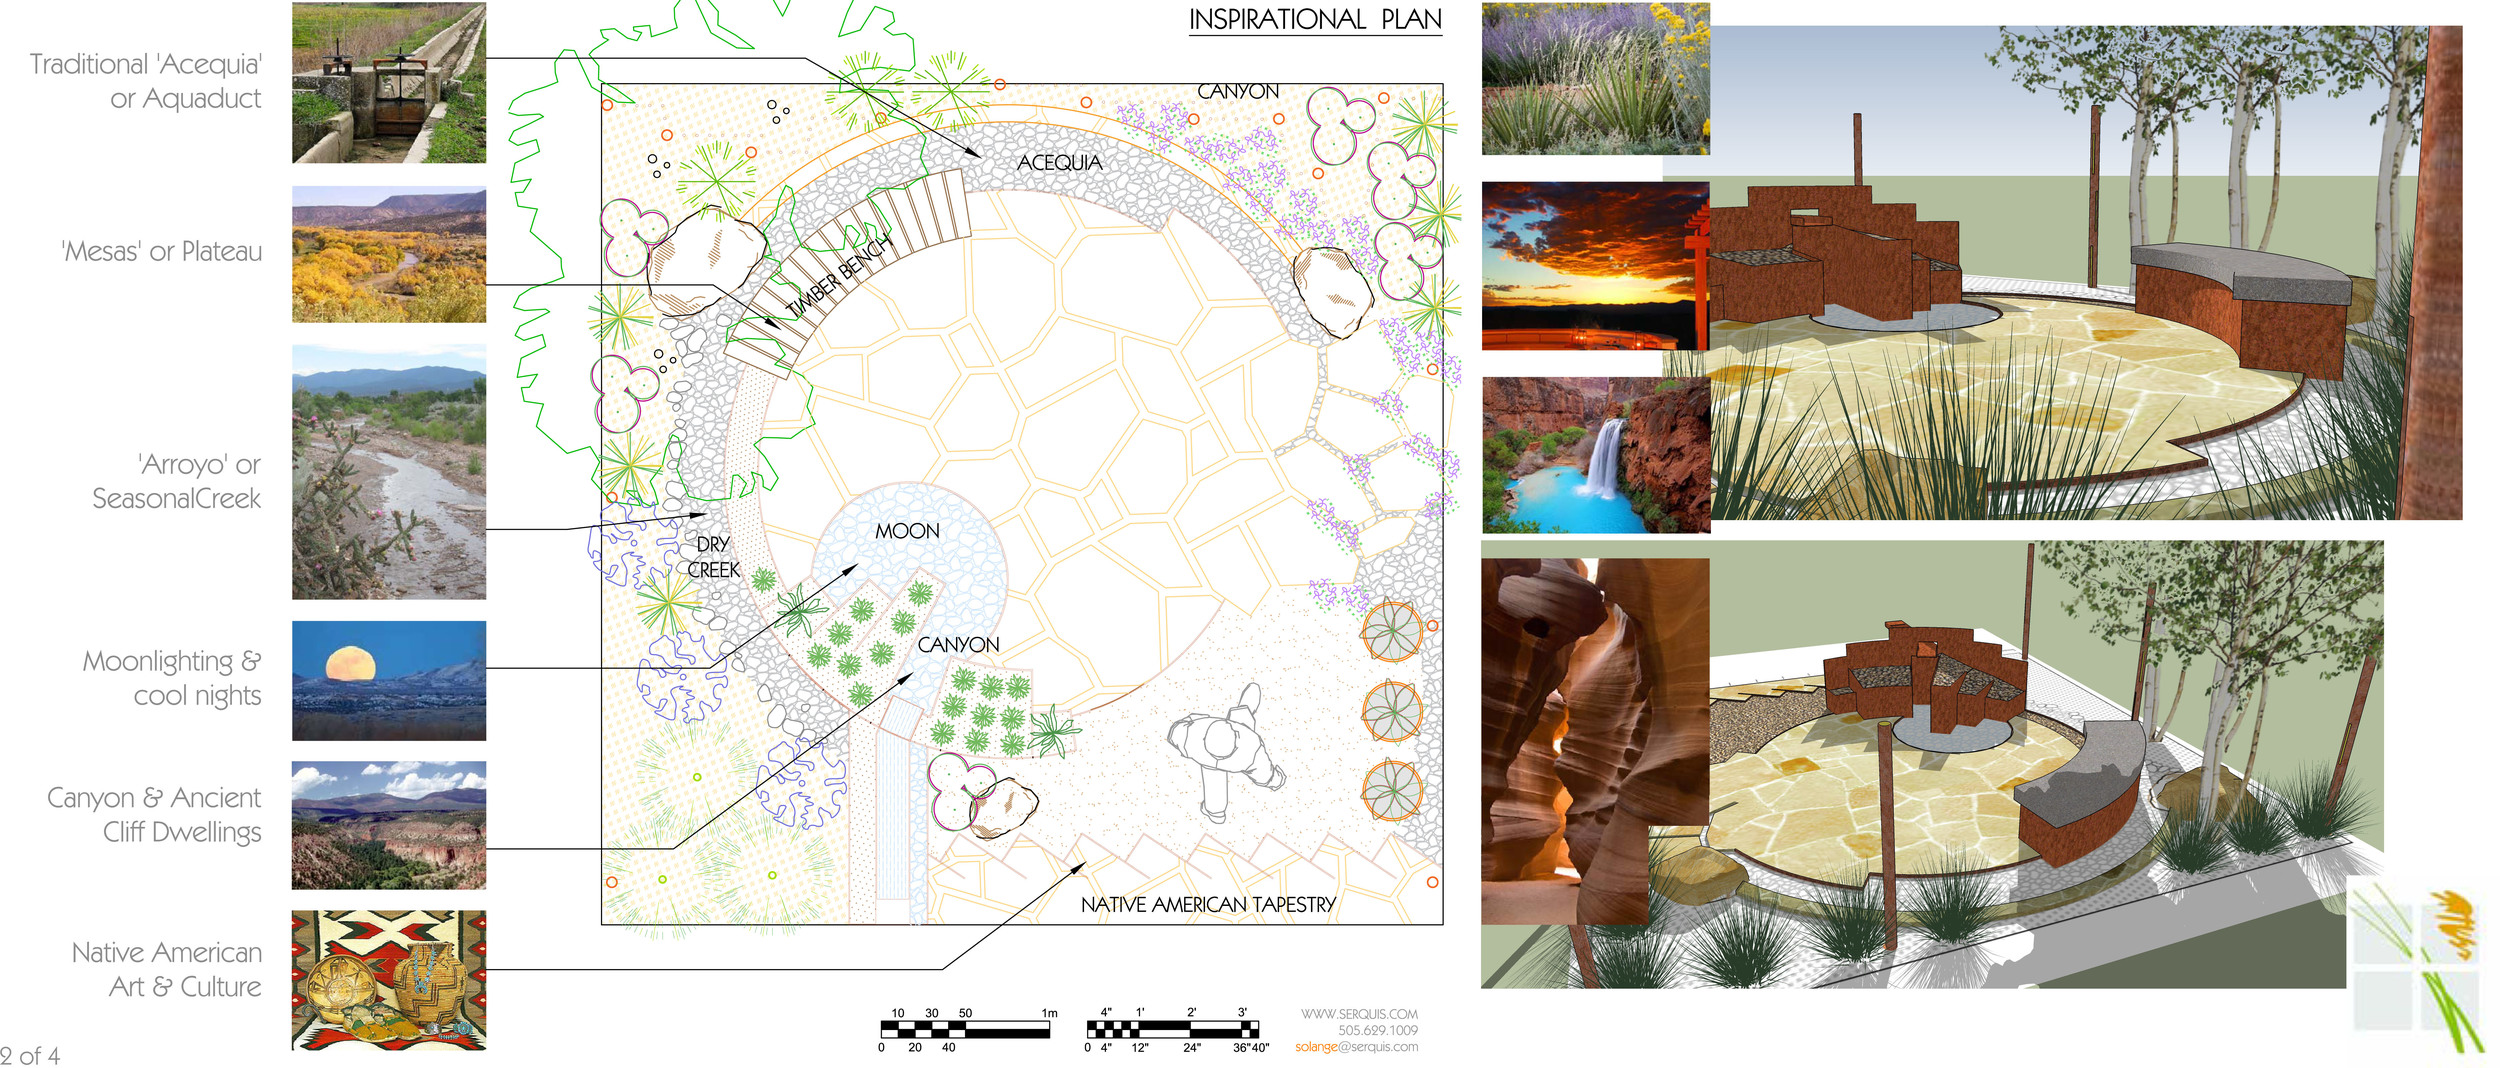 DesertLandscape-Inspiration.jpg